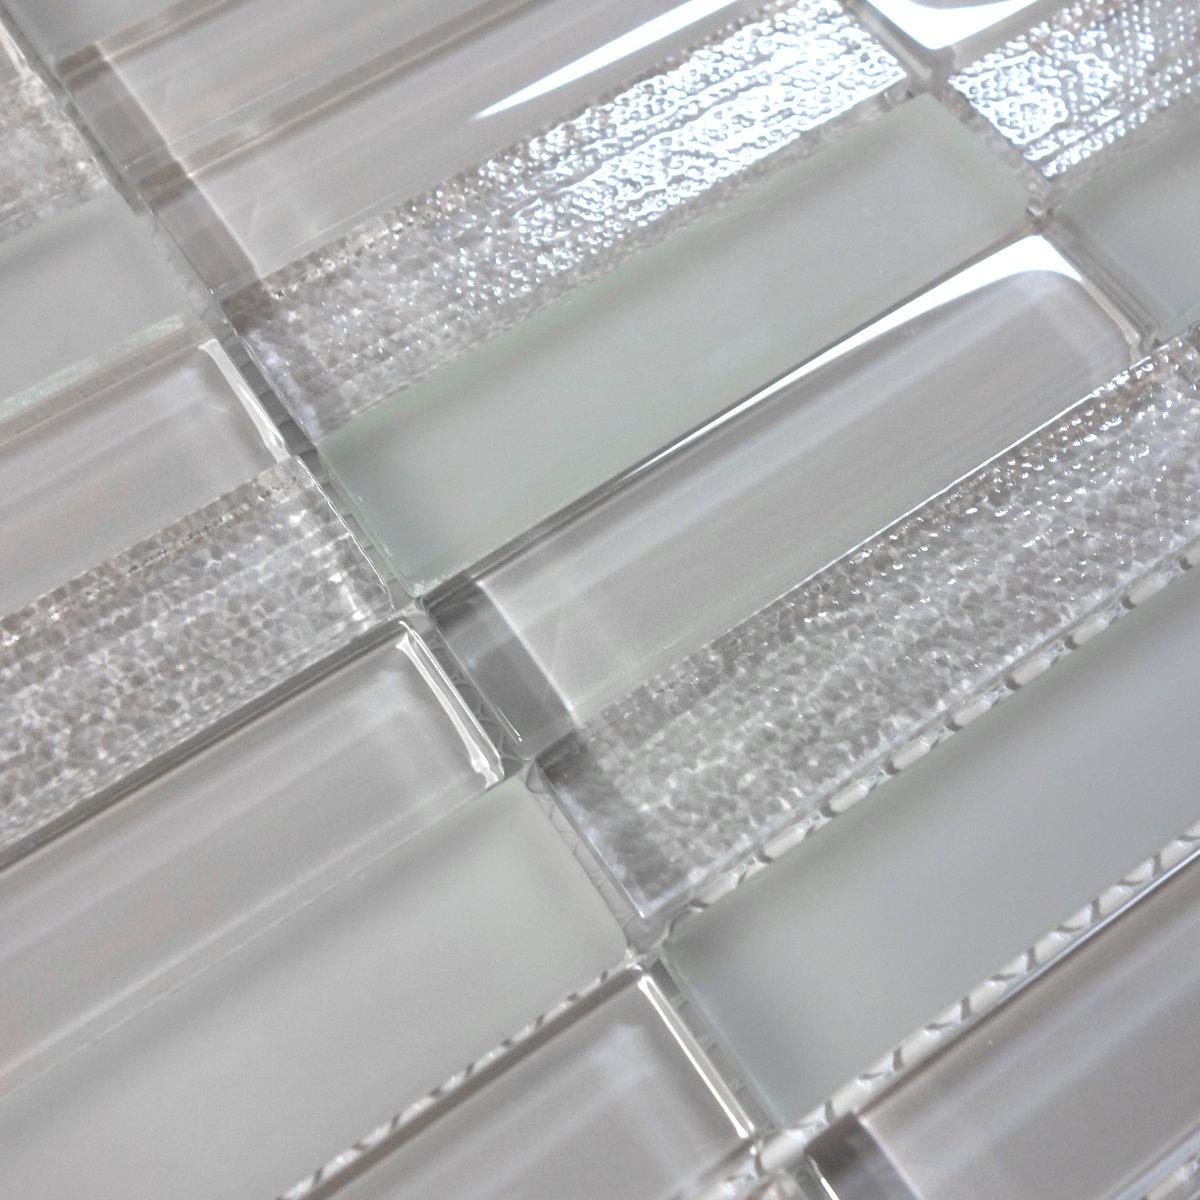 Modket TDH231MO-S Sample Modern Gray Crystal Glass Blend Texture and Matted Glass Mosaic Tile Backsplash